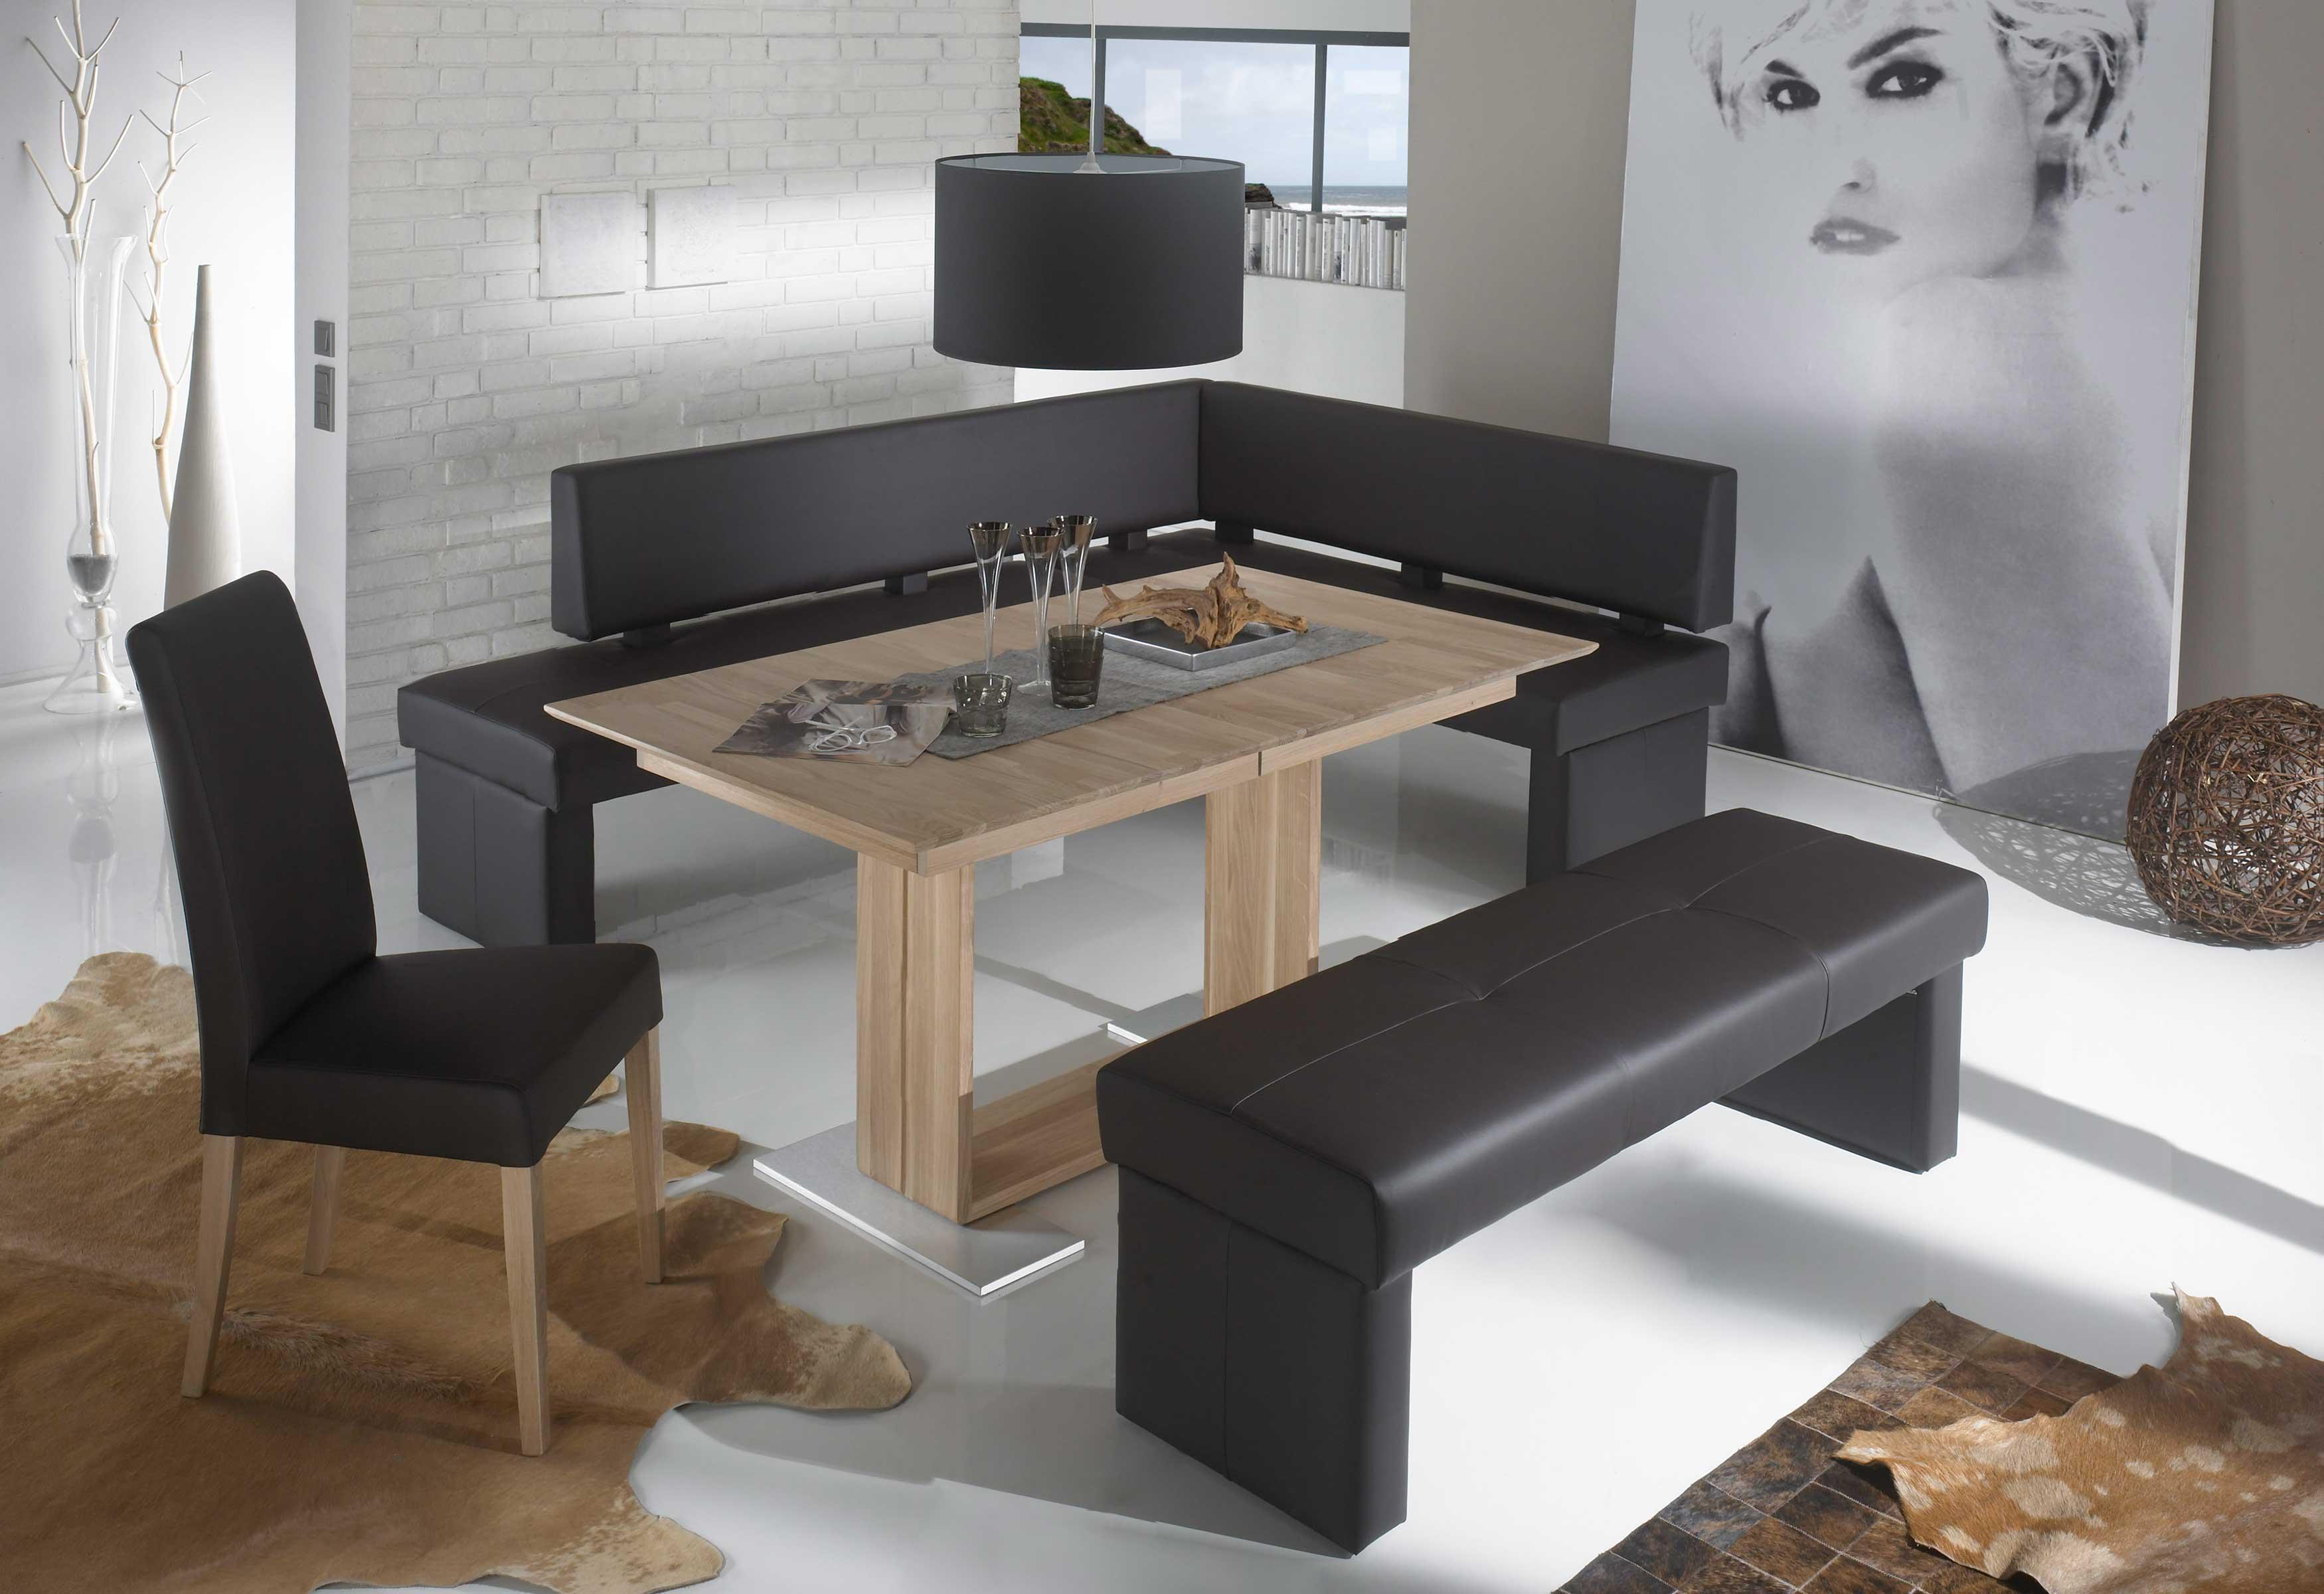 Standard Furniture Tischgruppe mit Domino Polsterbank Kunstleder